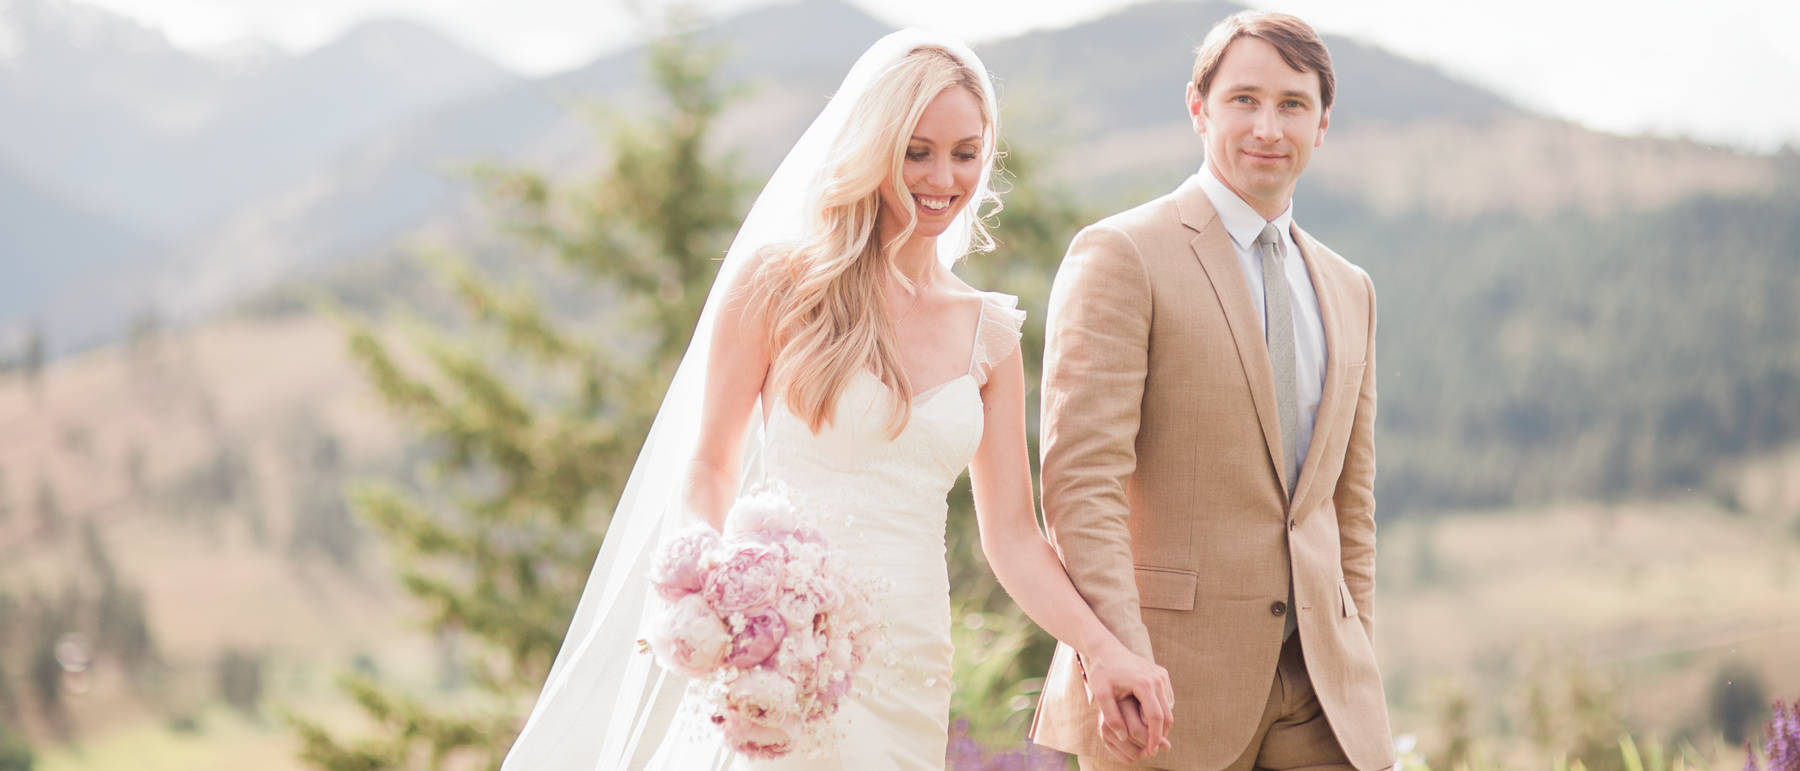 johnandjoseph-wedding-photographer-hz-slider-303